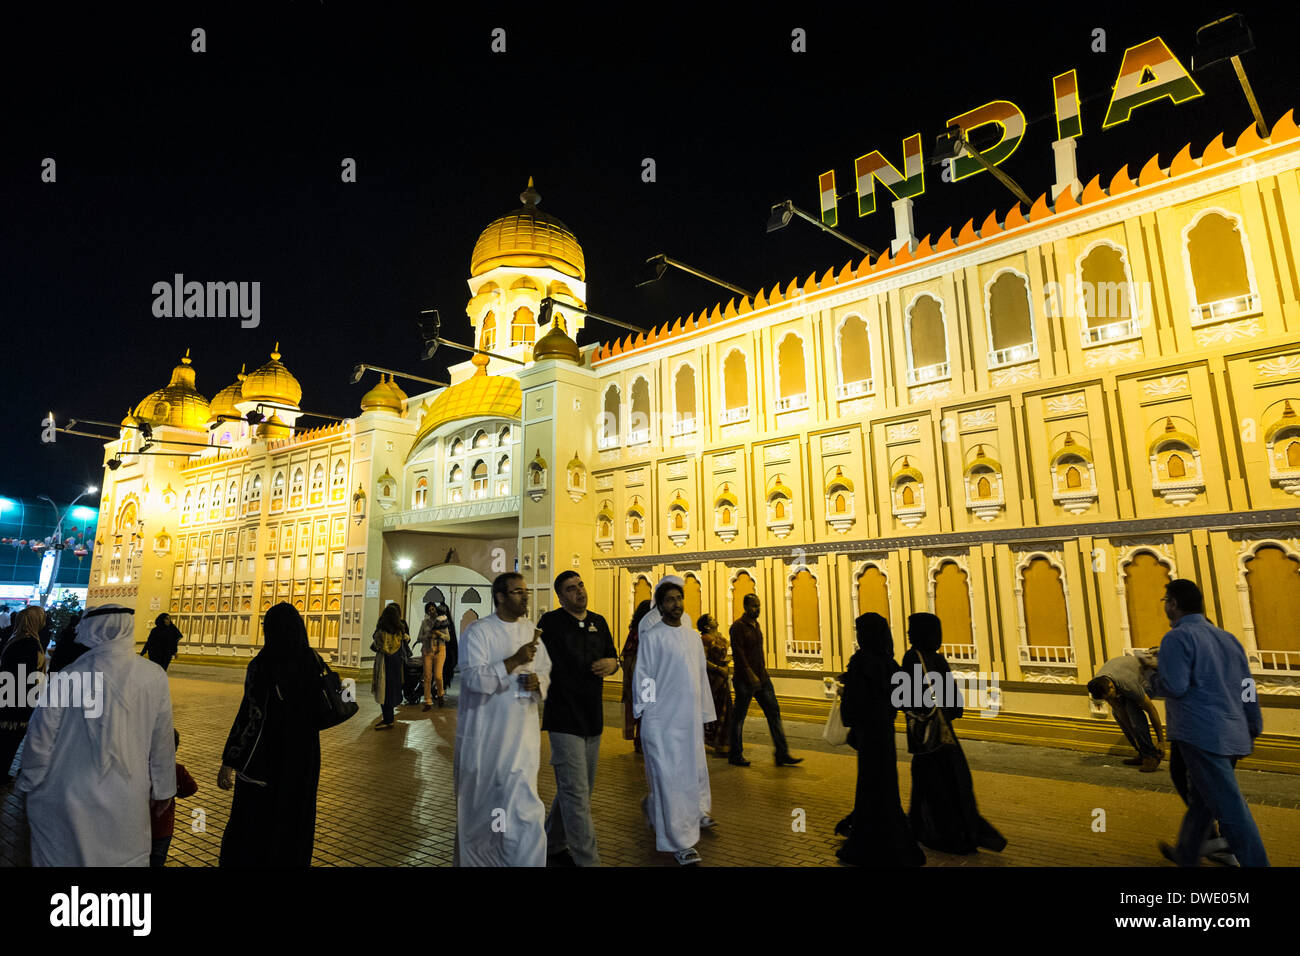 India Pavilion at Global Village tourist cultural attraction in Dubai United Arab Emirates - Stock Image